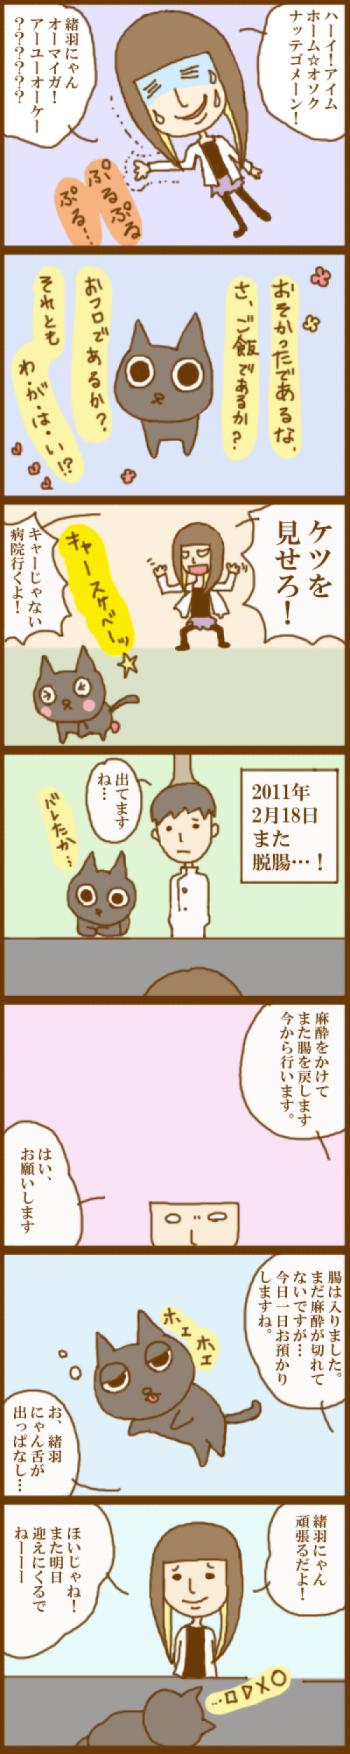 f:id:suzuokayu:20201116114044j:plain